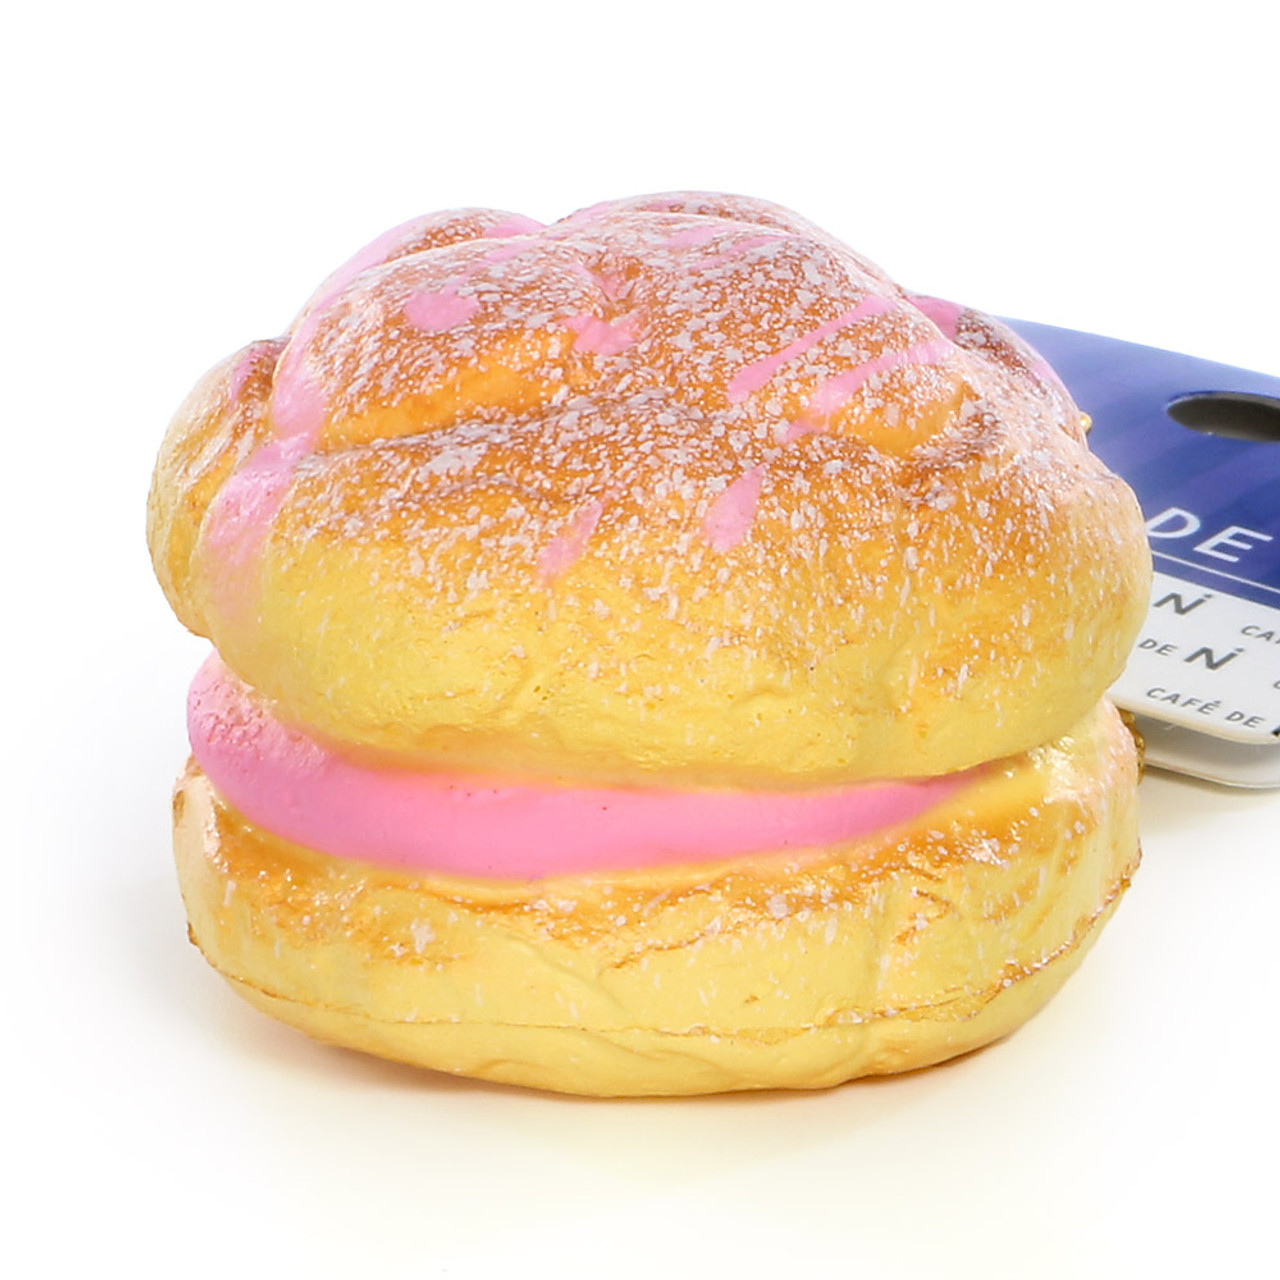 Café De N Strawberry Cream Puff Dessert Squishy Toy Cellphone Charms ( 45 Degree Angle )